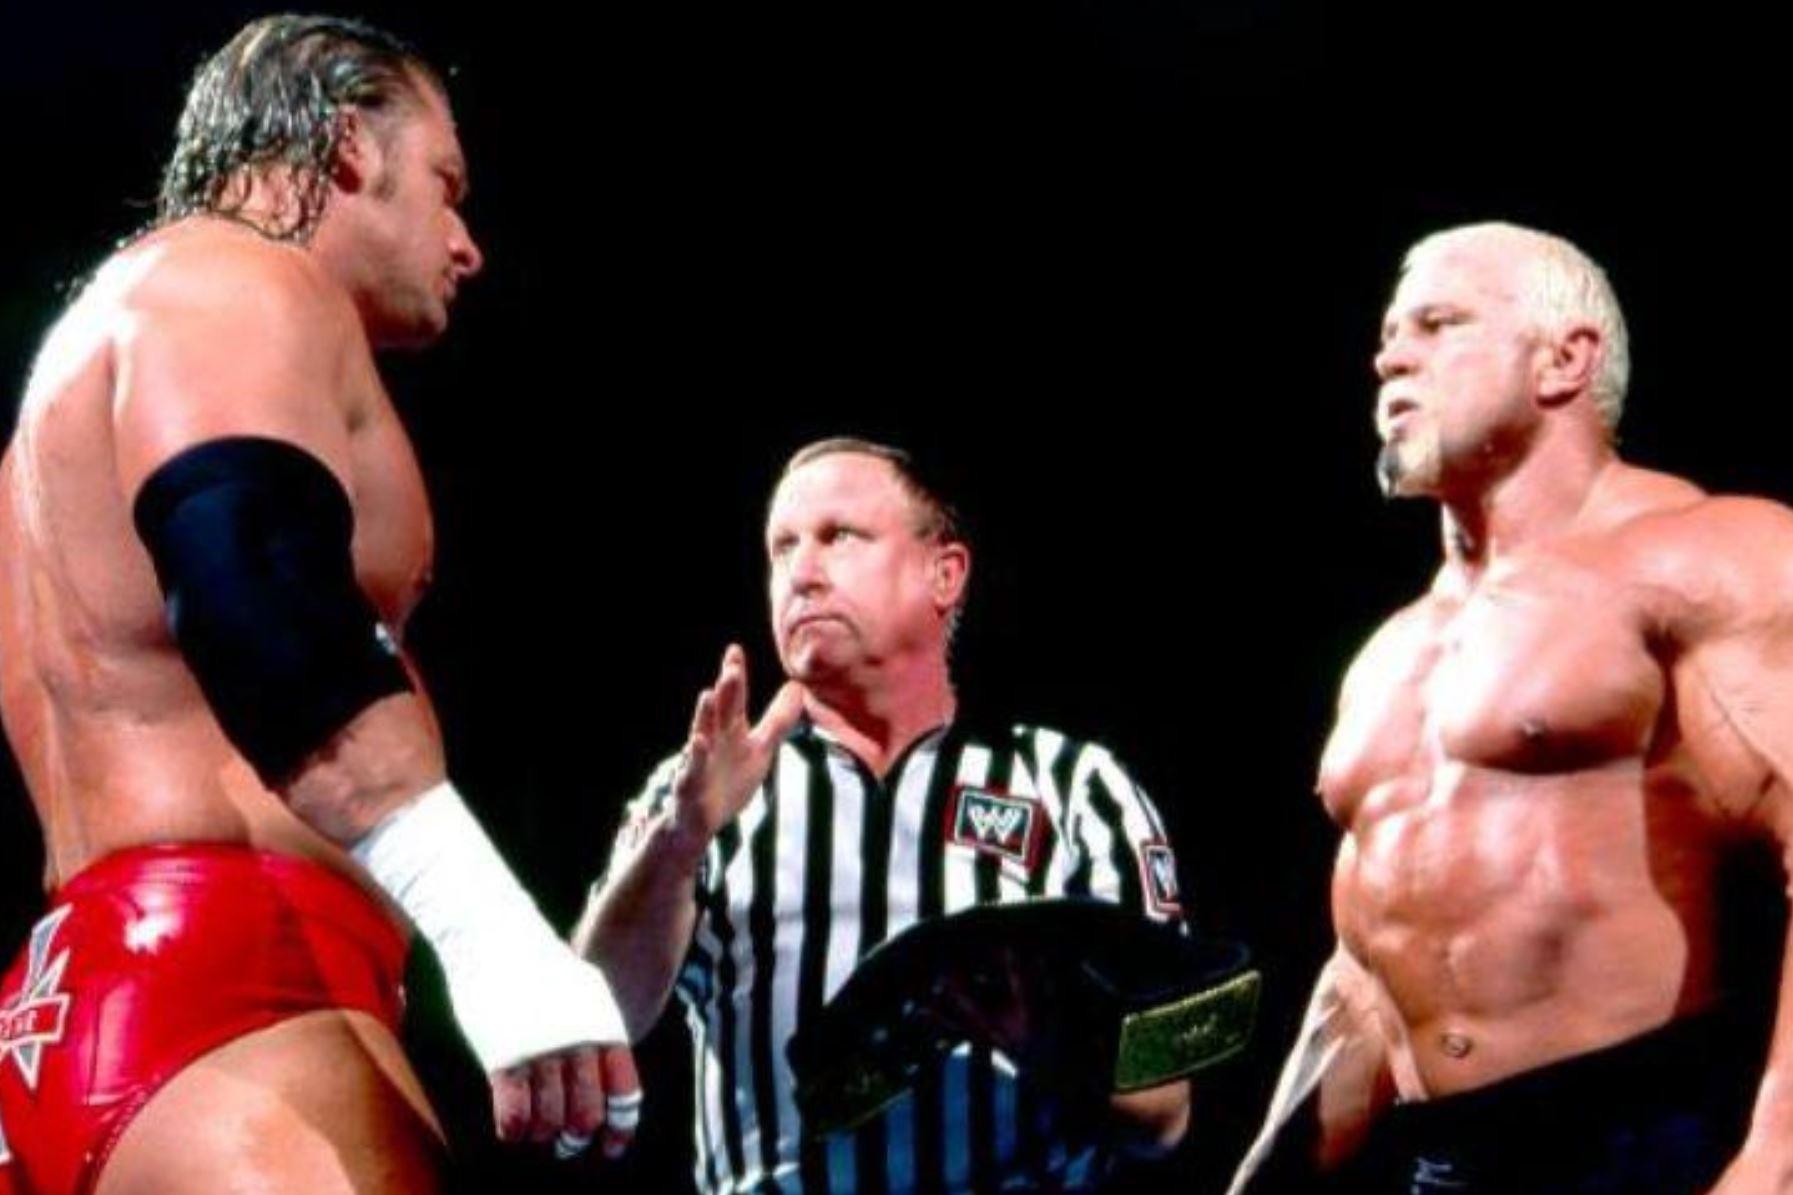 Scott Steiner Vs. Triple H